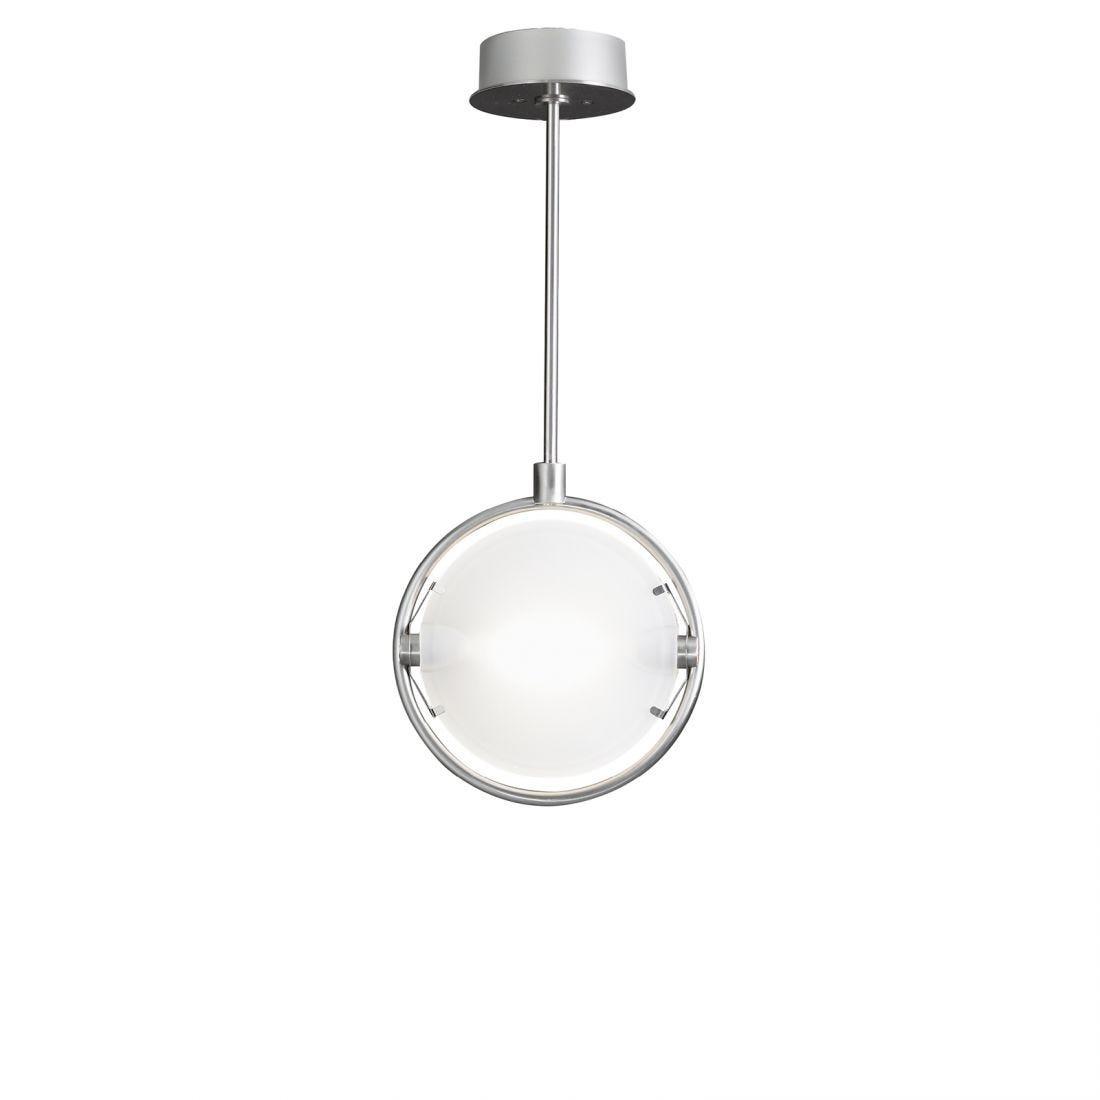 Fontana Arte Nobi Medium LED Hanglamp